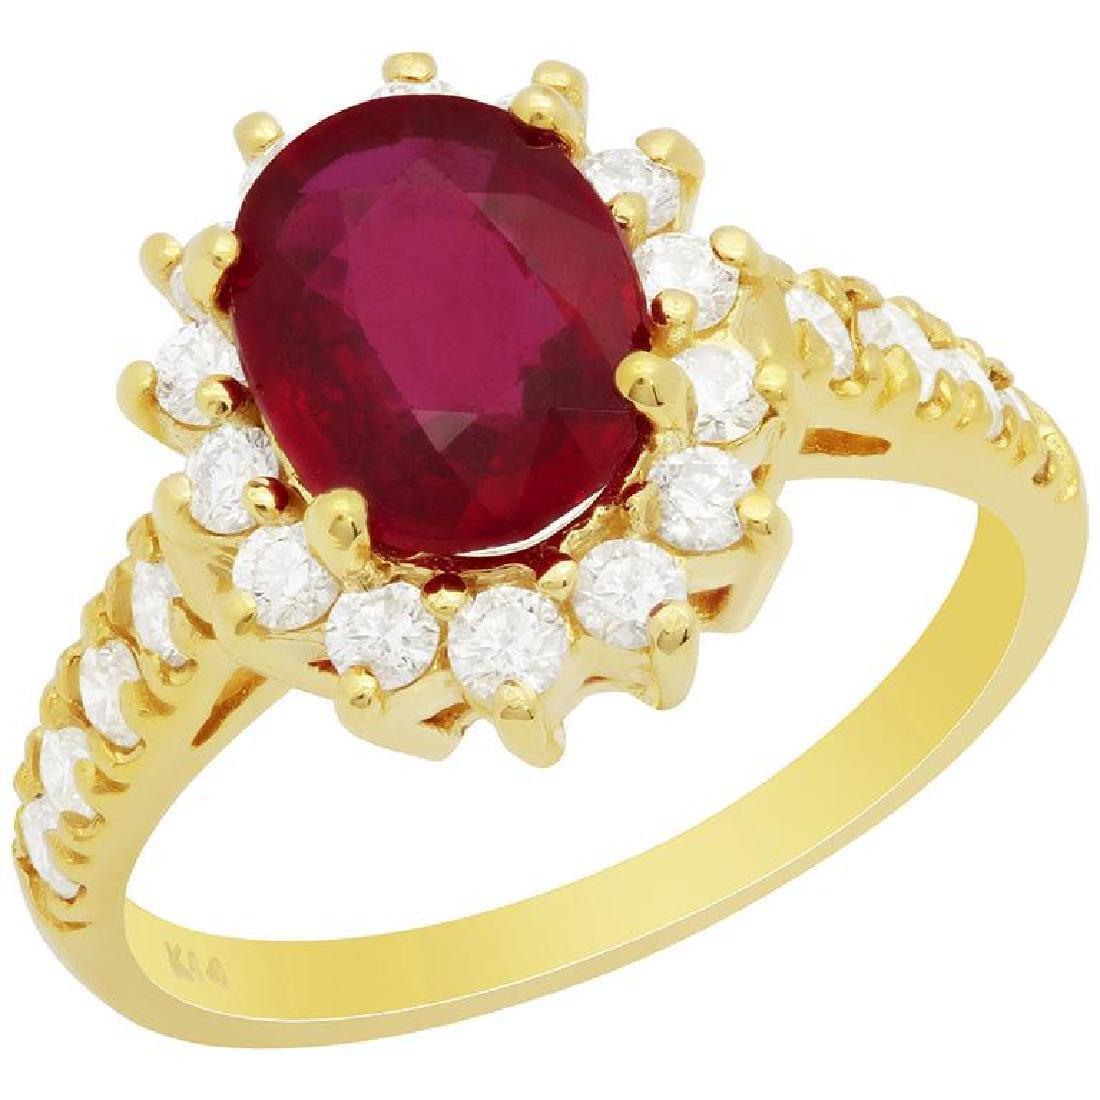 14k Yellow Gold 2.23ct Ruby 0.75ct Diamond Ring